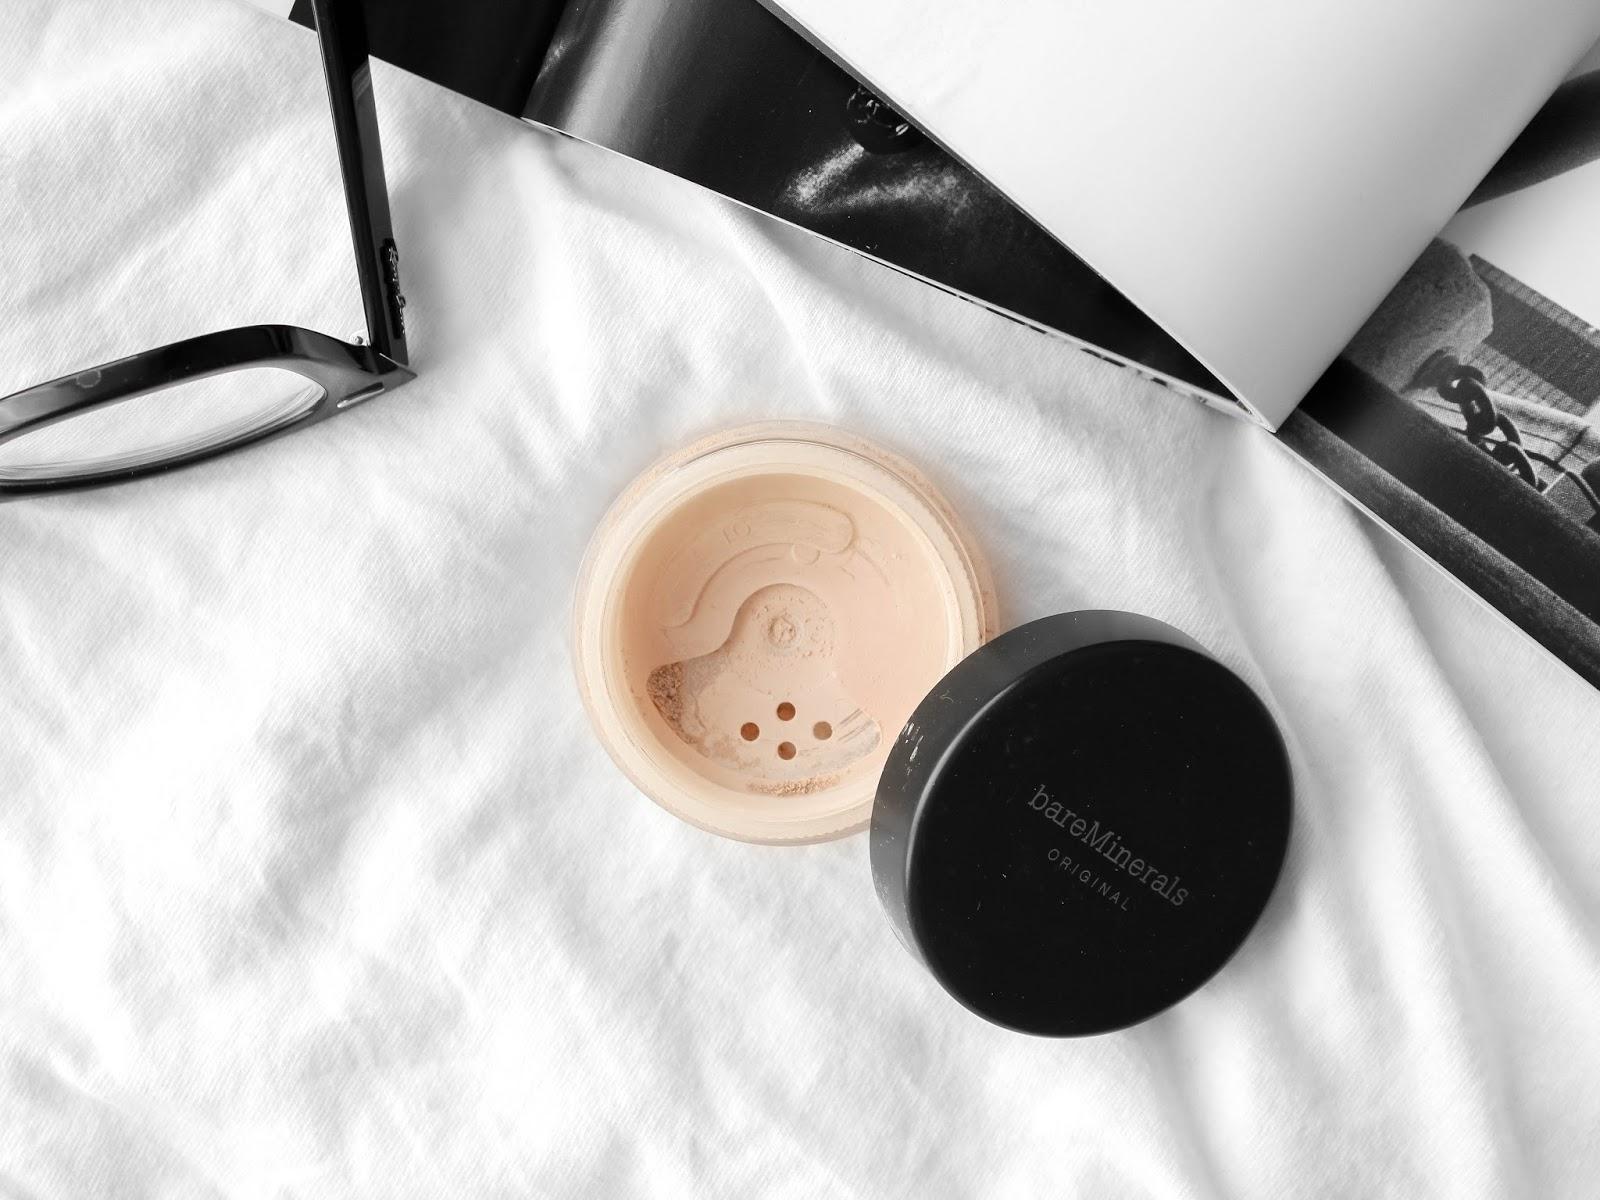 minerální makeup bareminerals